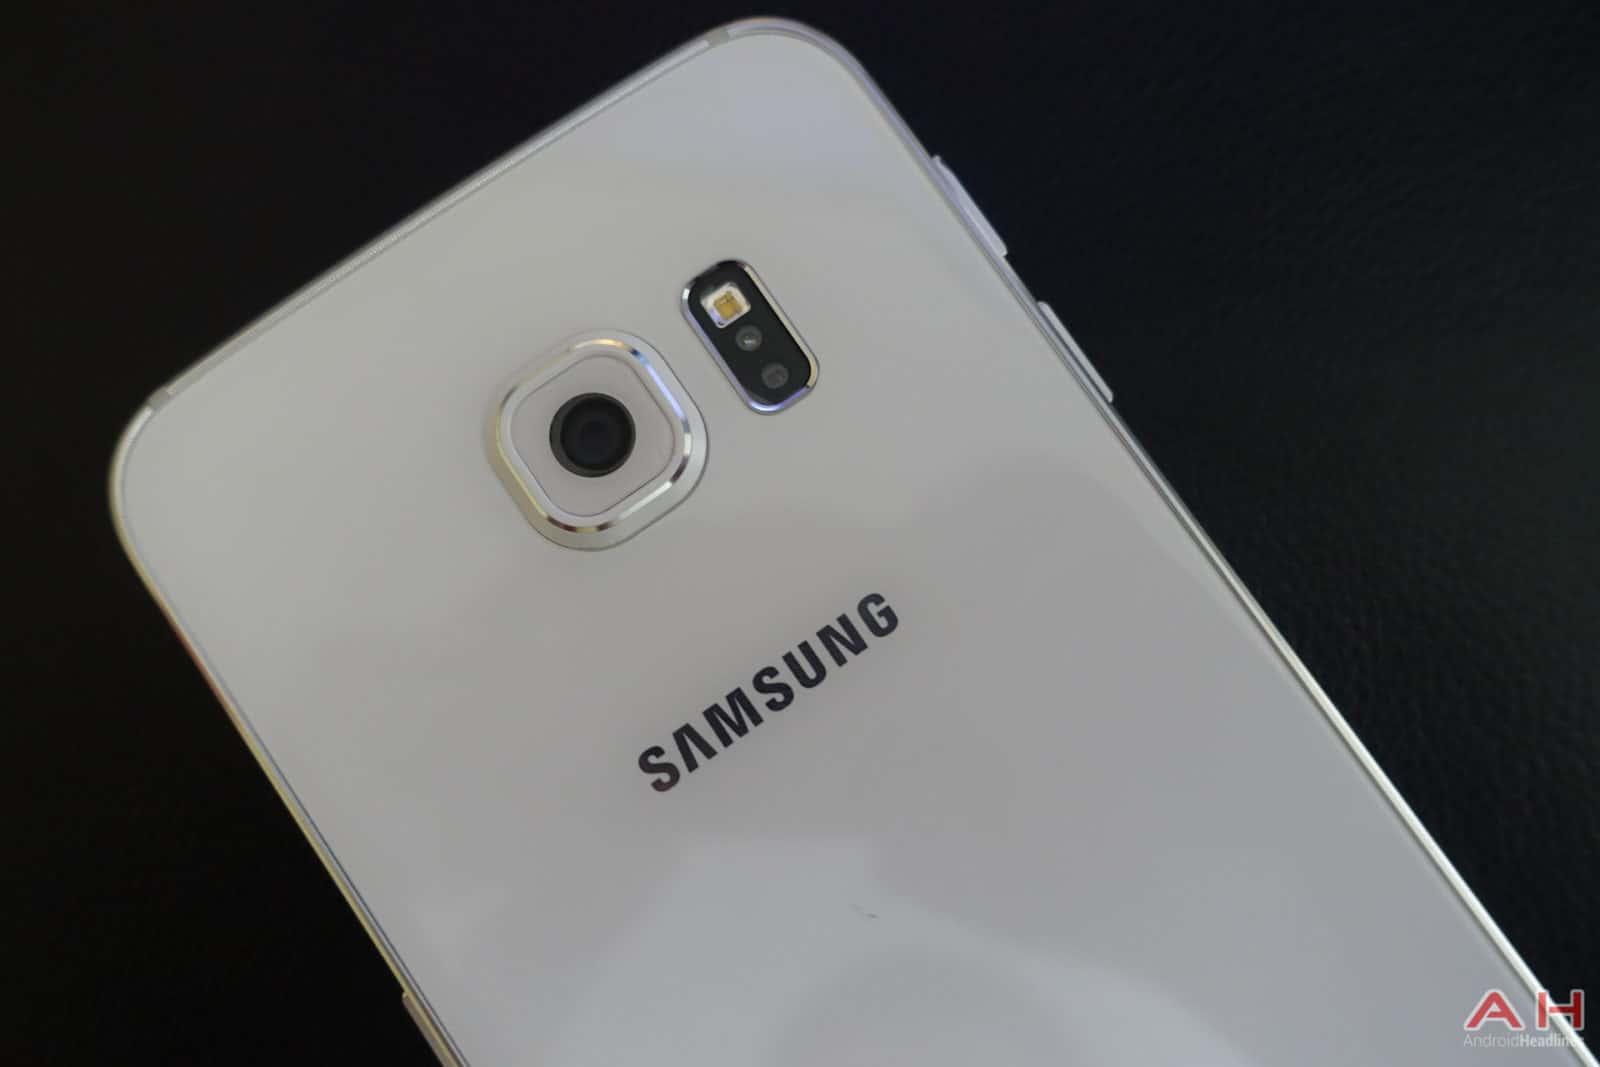 Samsung-Galaxy-S6-Edge-AH-3